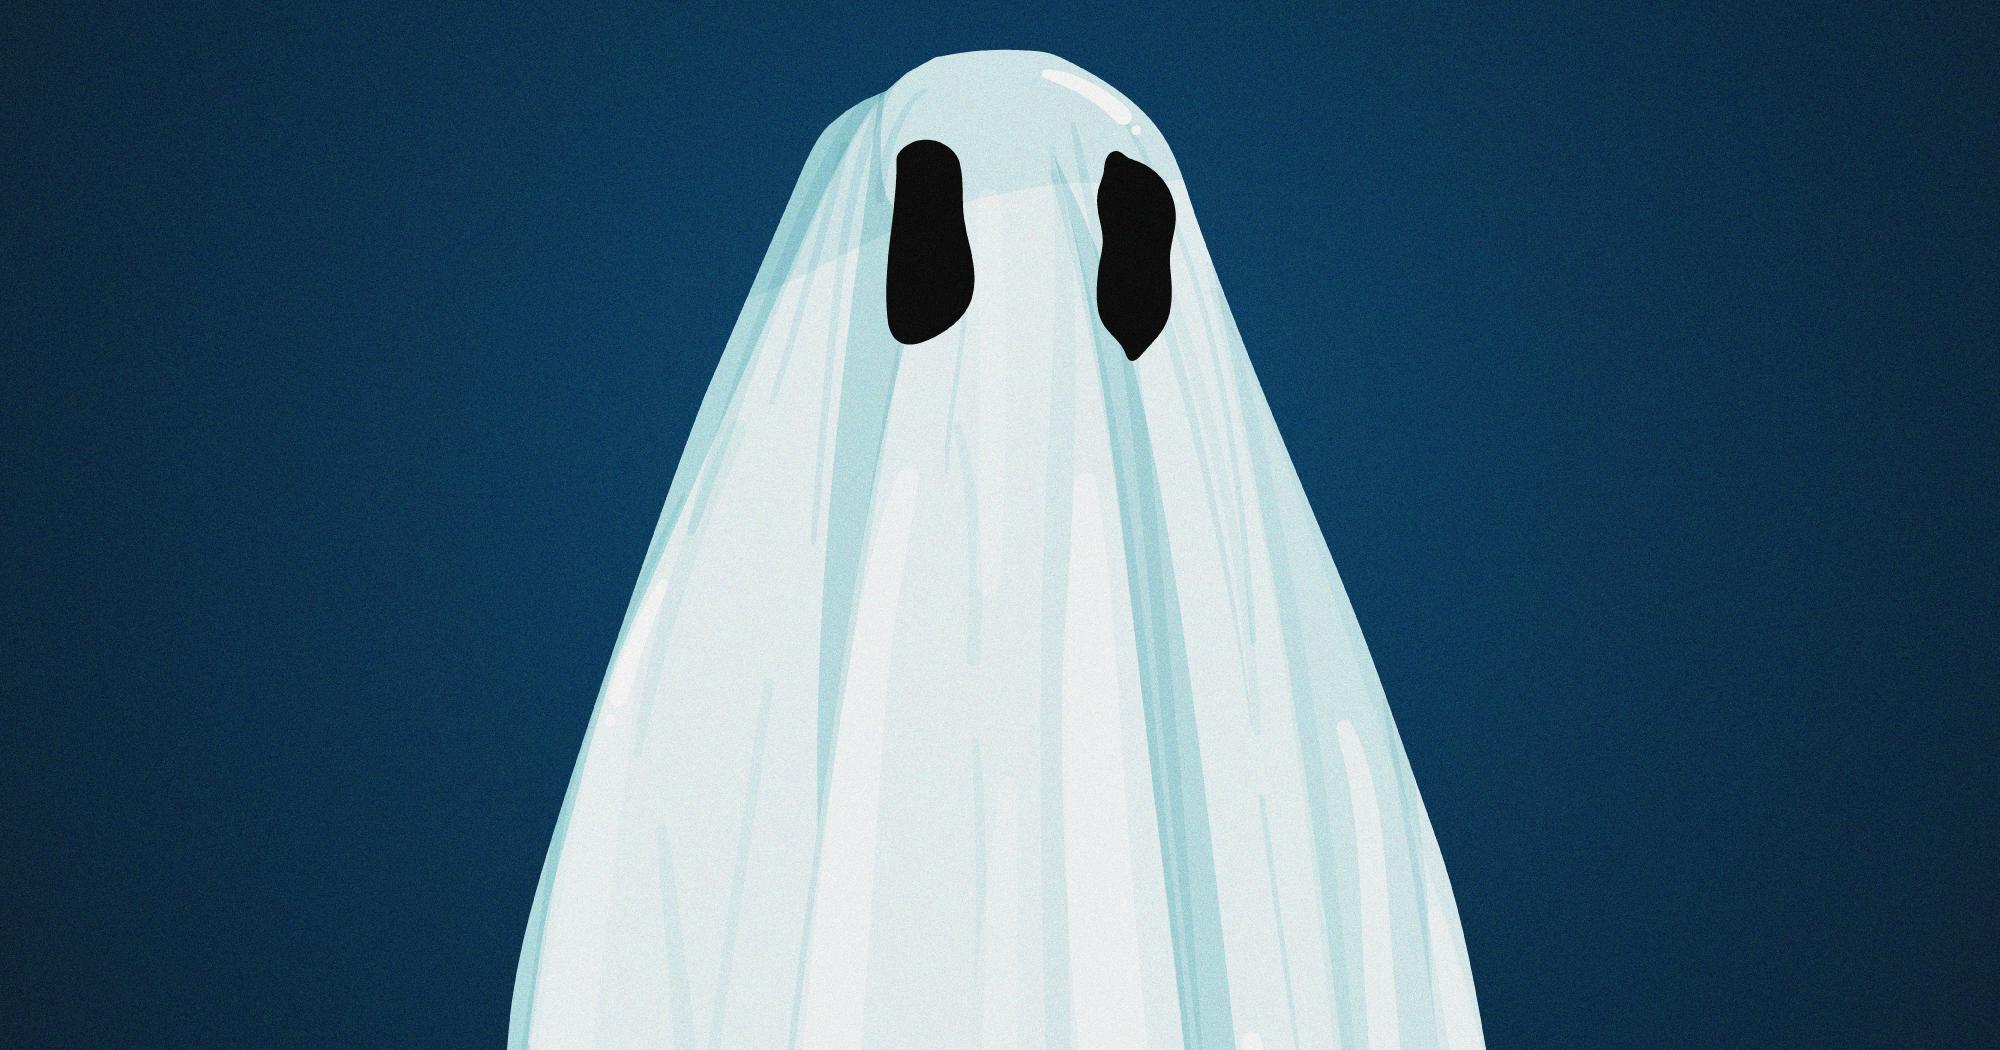 11 Of The Spookiest Real-Life Ghost Stories On Reddit